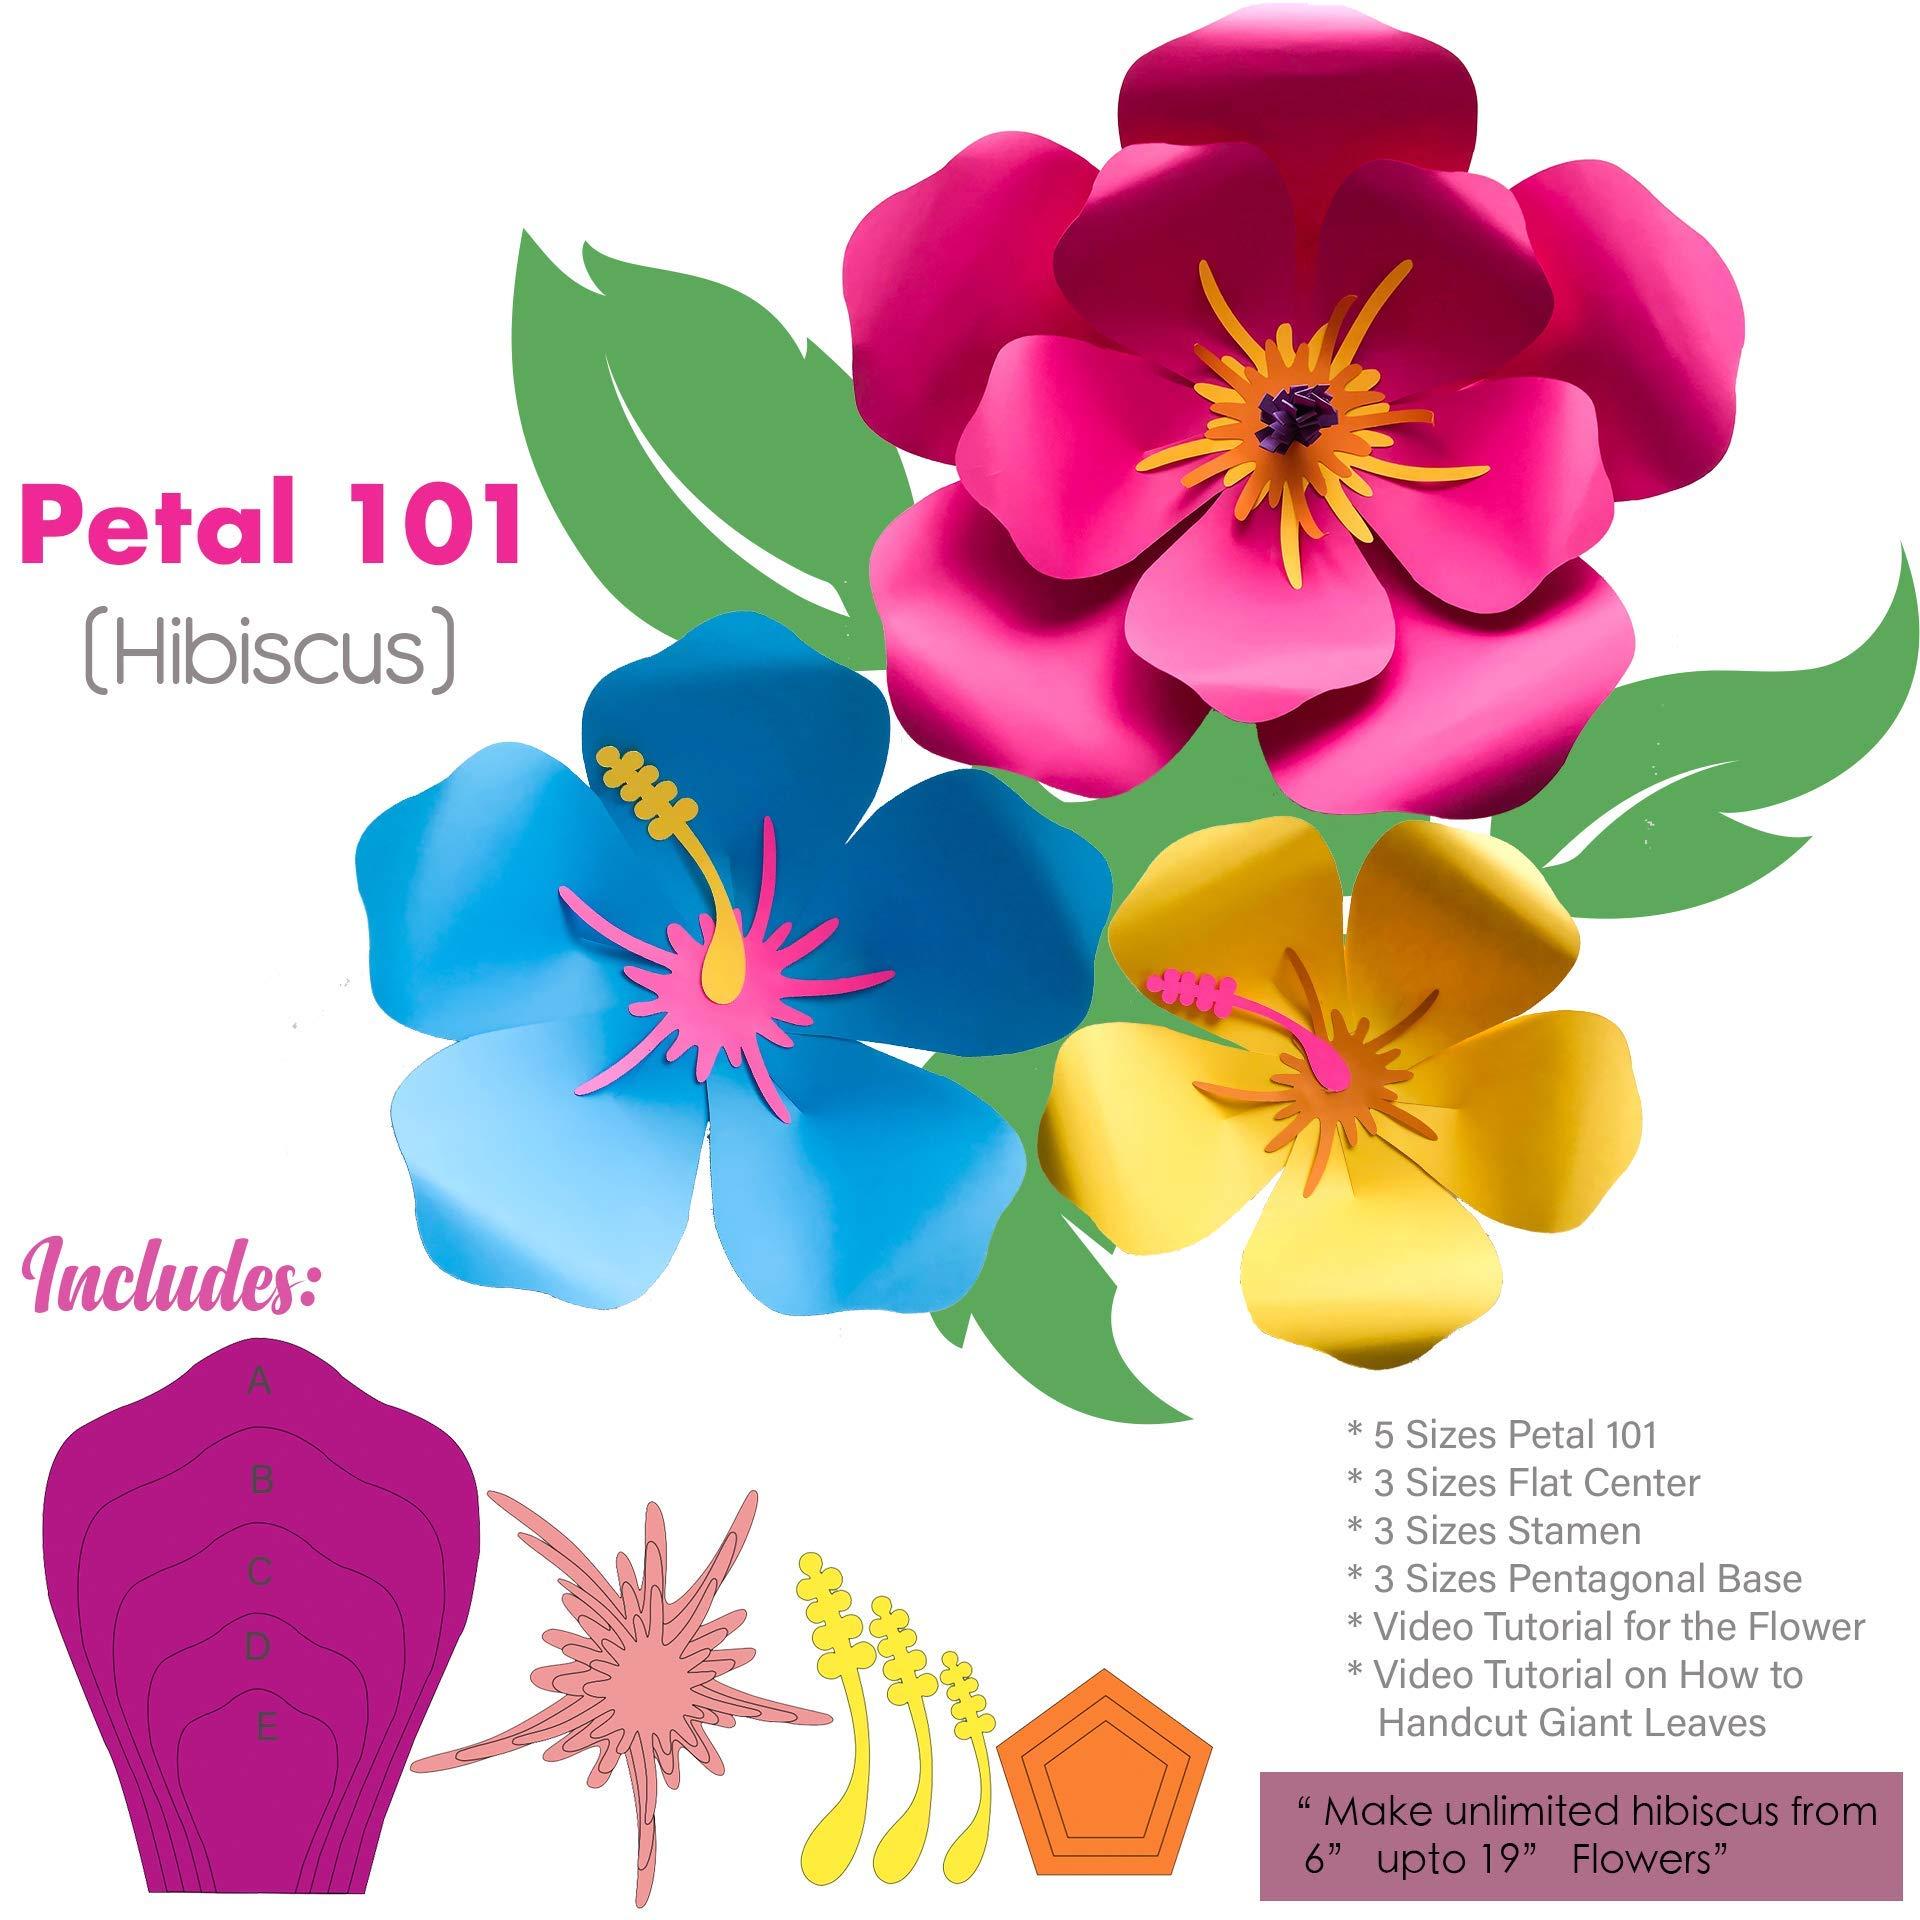 Hibiscus Petal 101 Giant Paper Flower Templates Kit 6-7 Sizes